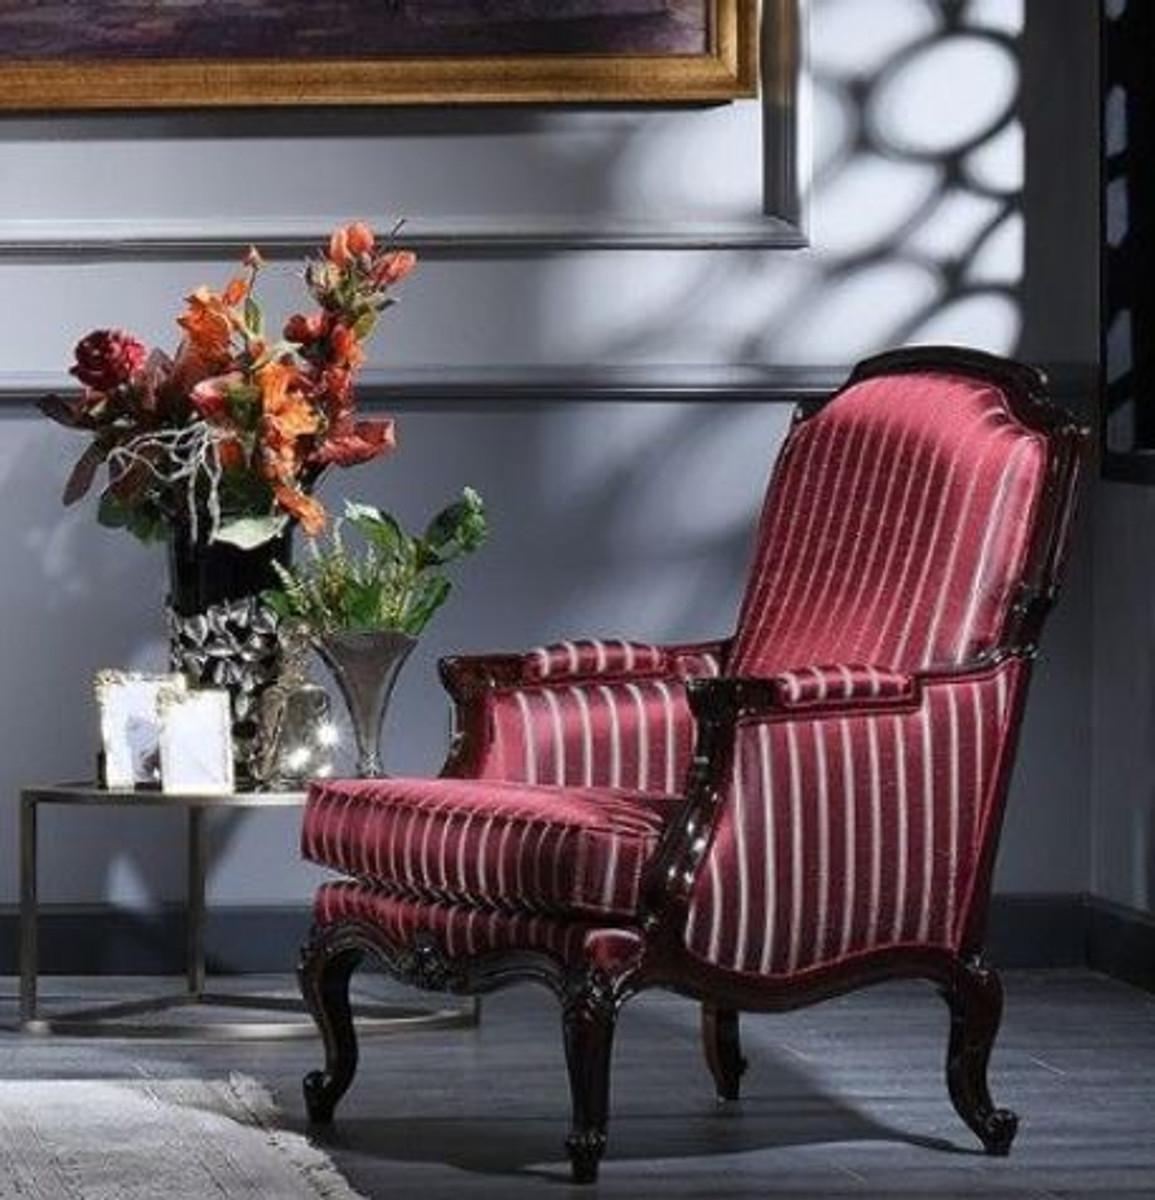 Casa Padrino Luxus Barock Sessel Bordeauxrot / Silber / Schwarz 77 x 85 x H. 110 cm - Gestreifter Wohnzimmer Sessel im Barockstil 2